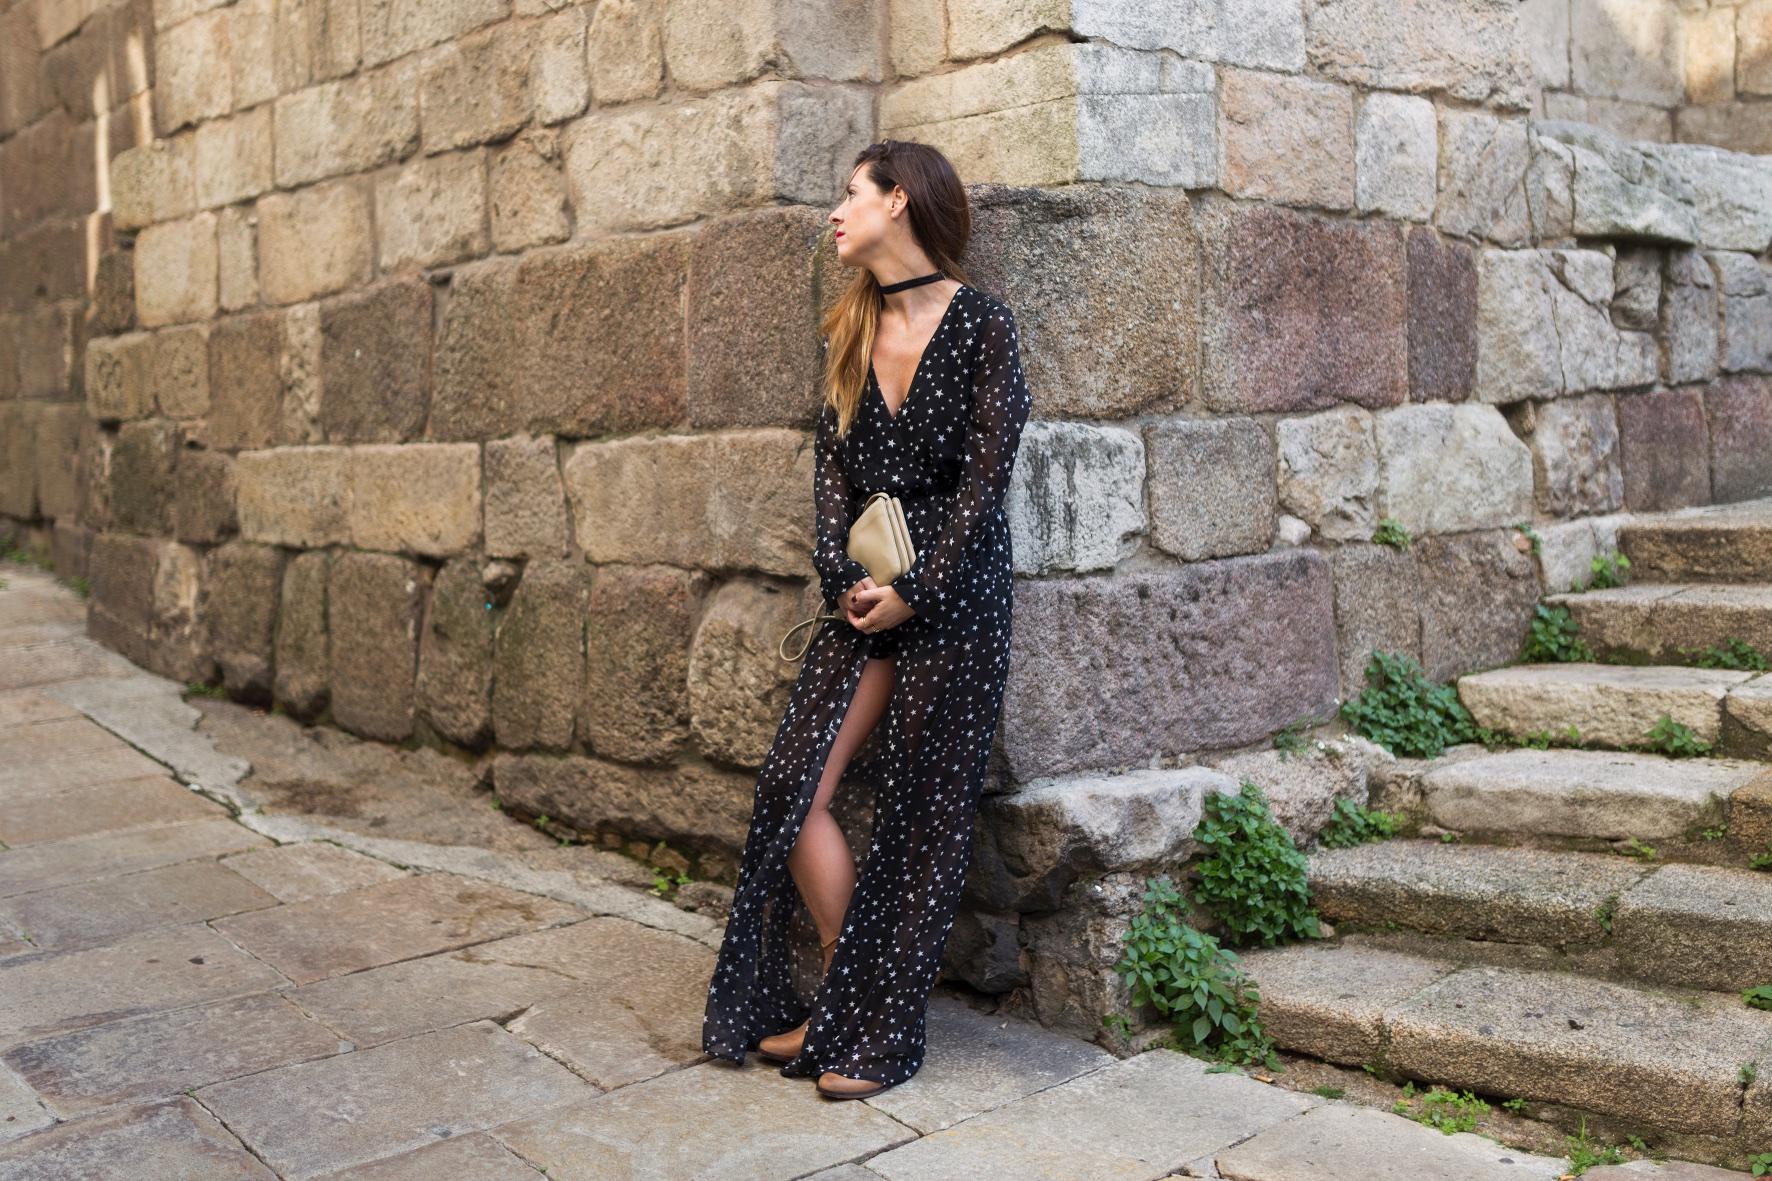 shein-dress-fashion-blogger-descalzaporelparque-4